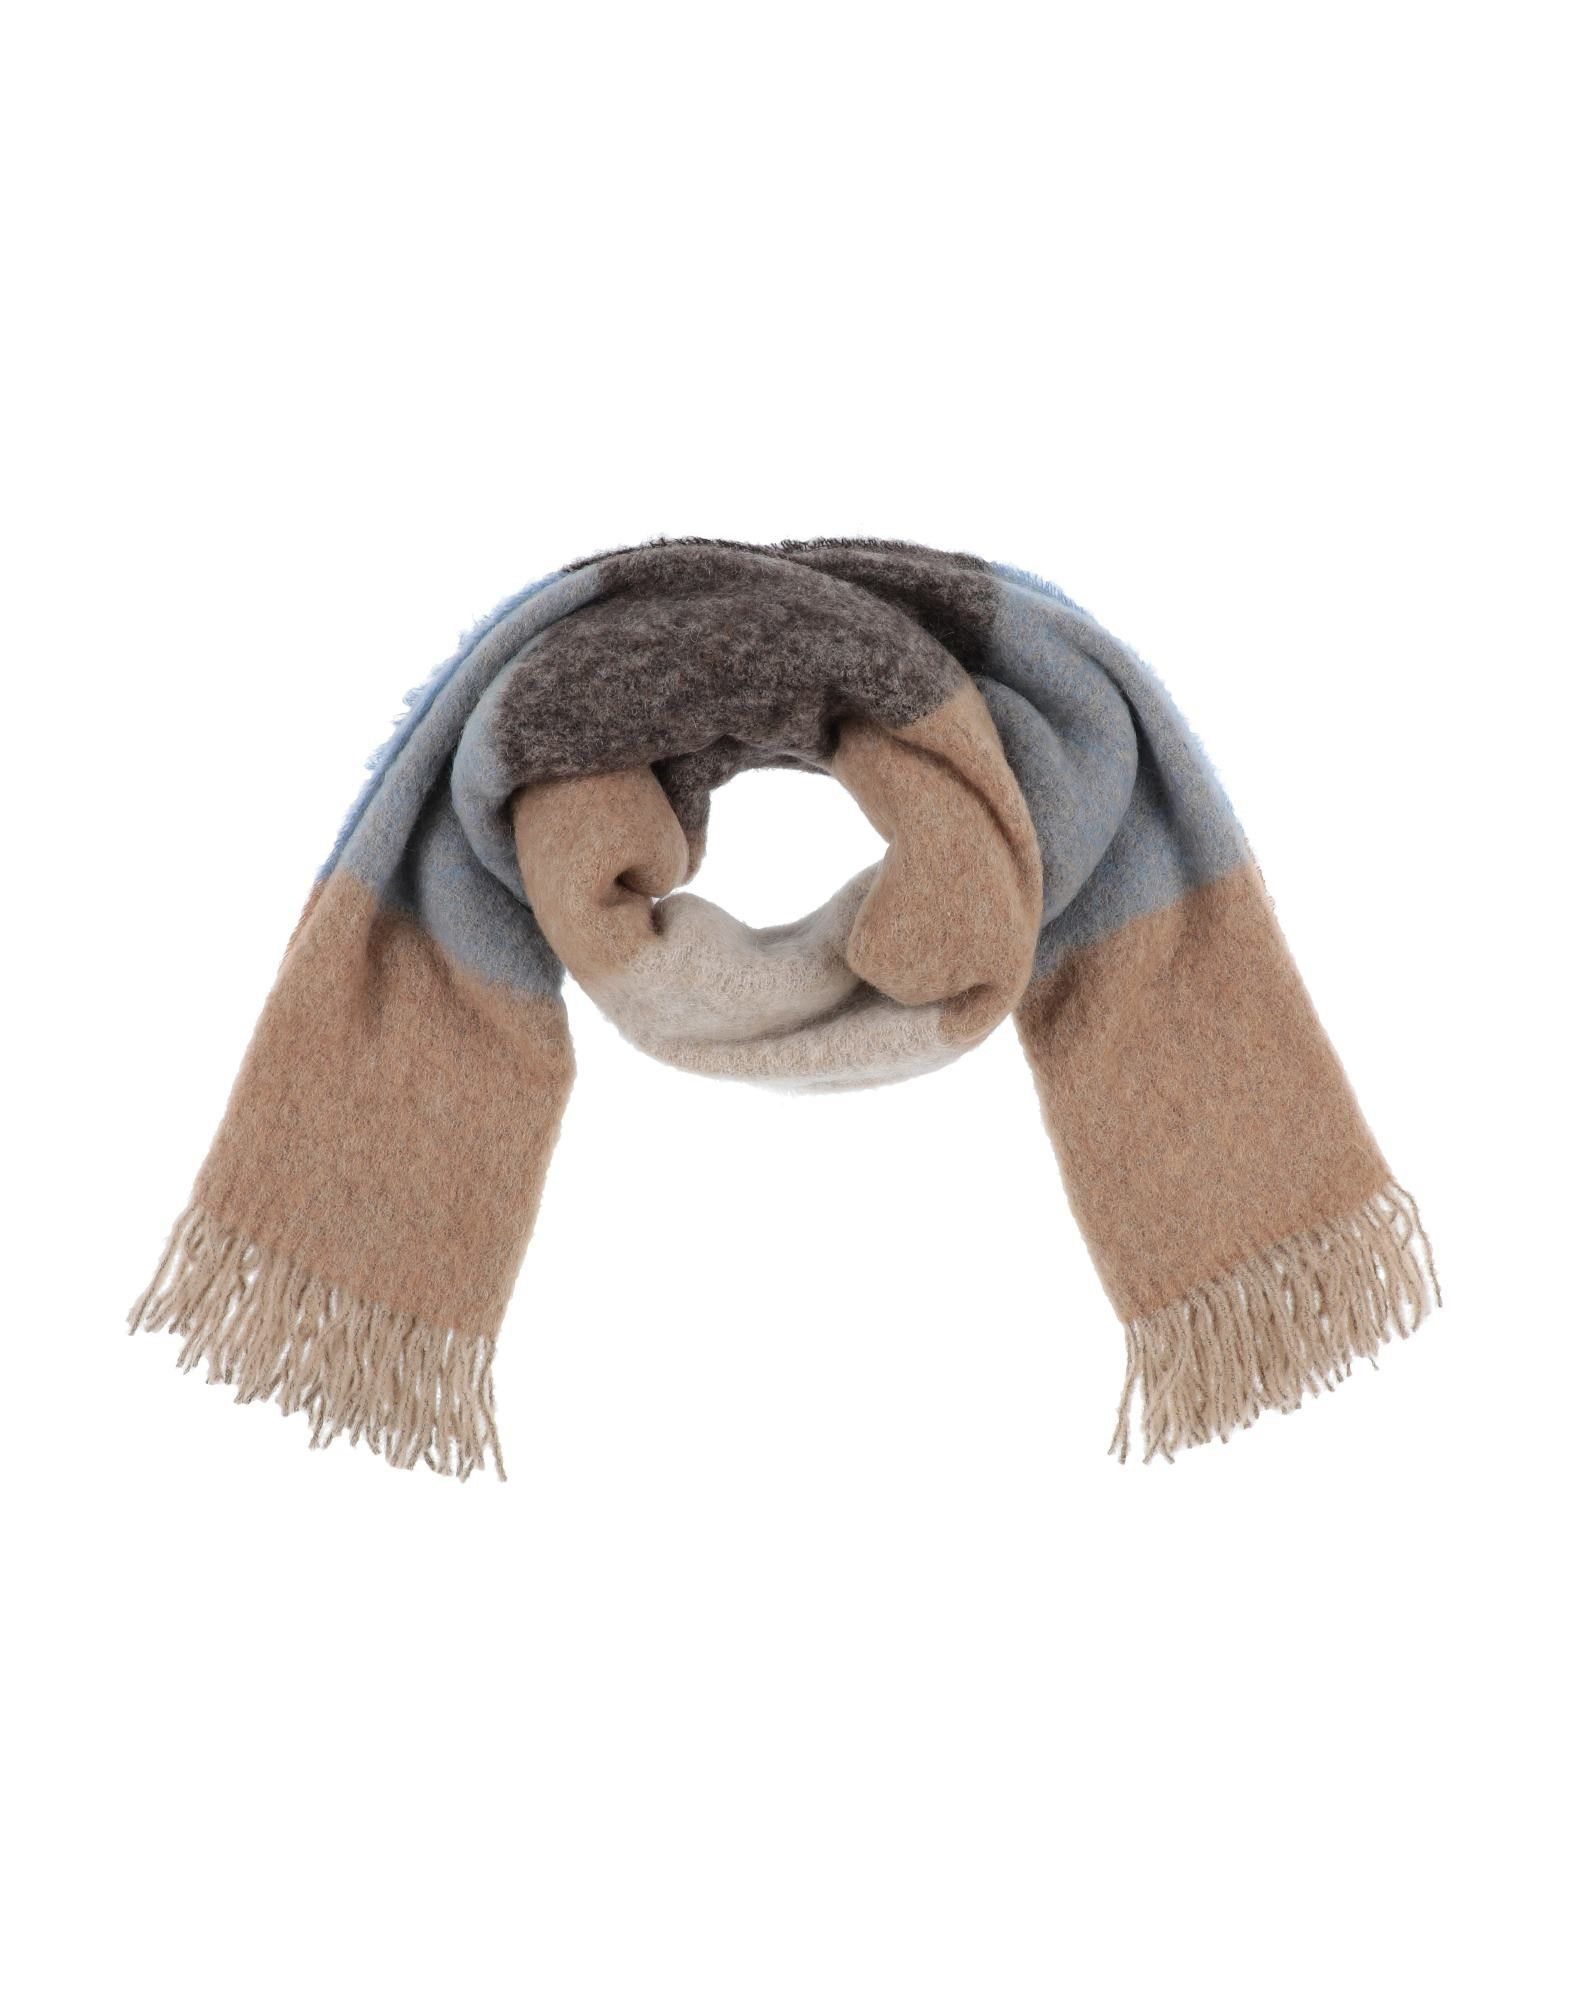 DSQUARED2 Stoles. boiled wool, no appliqués, tartan plaid. 28% Alpaca wool, 28% Mohair wool, 24% Wool, 20% Polyamide